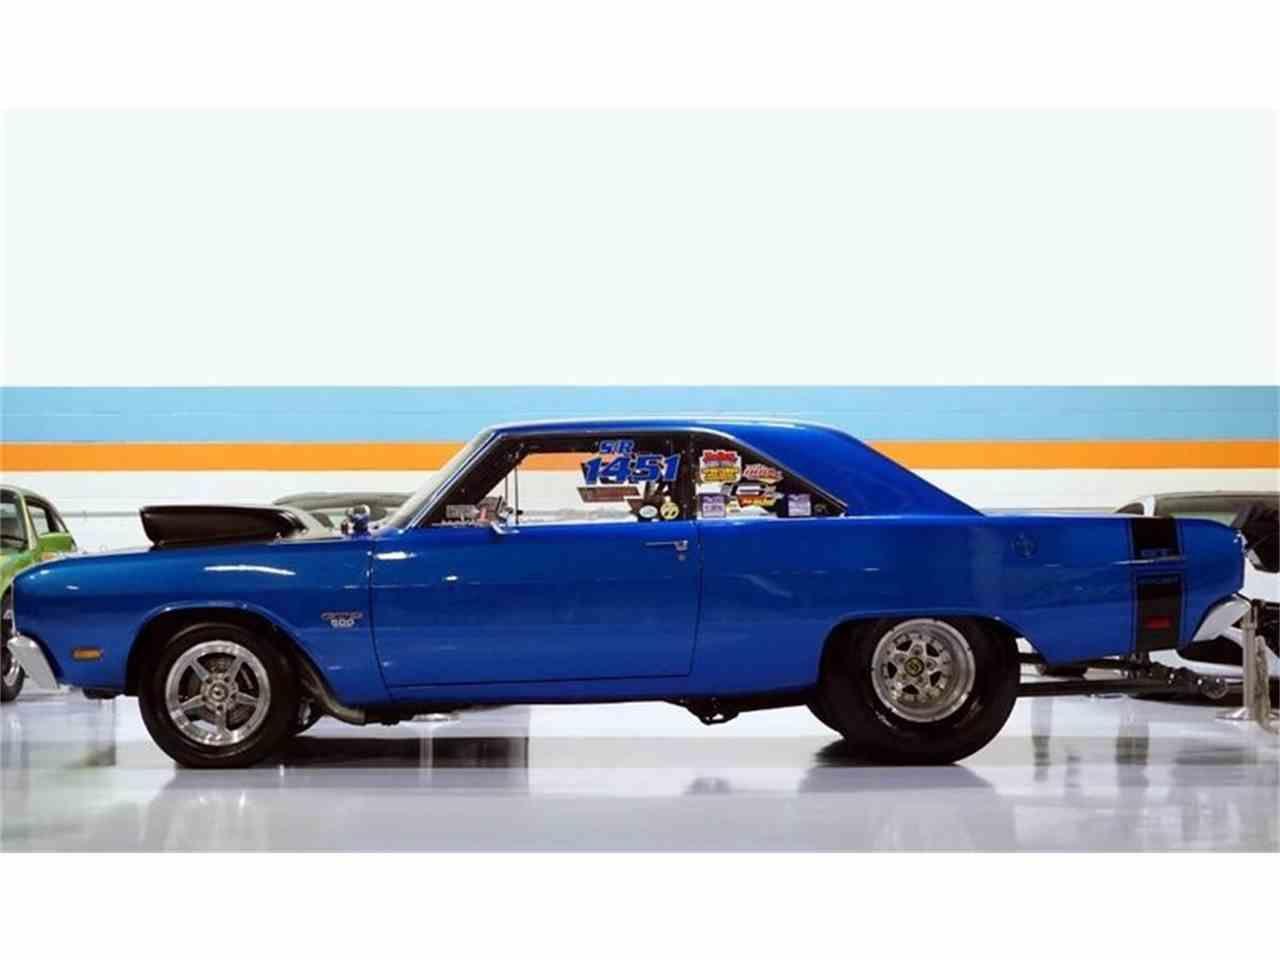 1969 Dodge Dart For Sale Classiccars Com Cc 1042226 Dodge